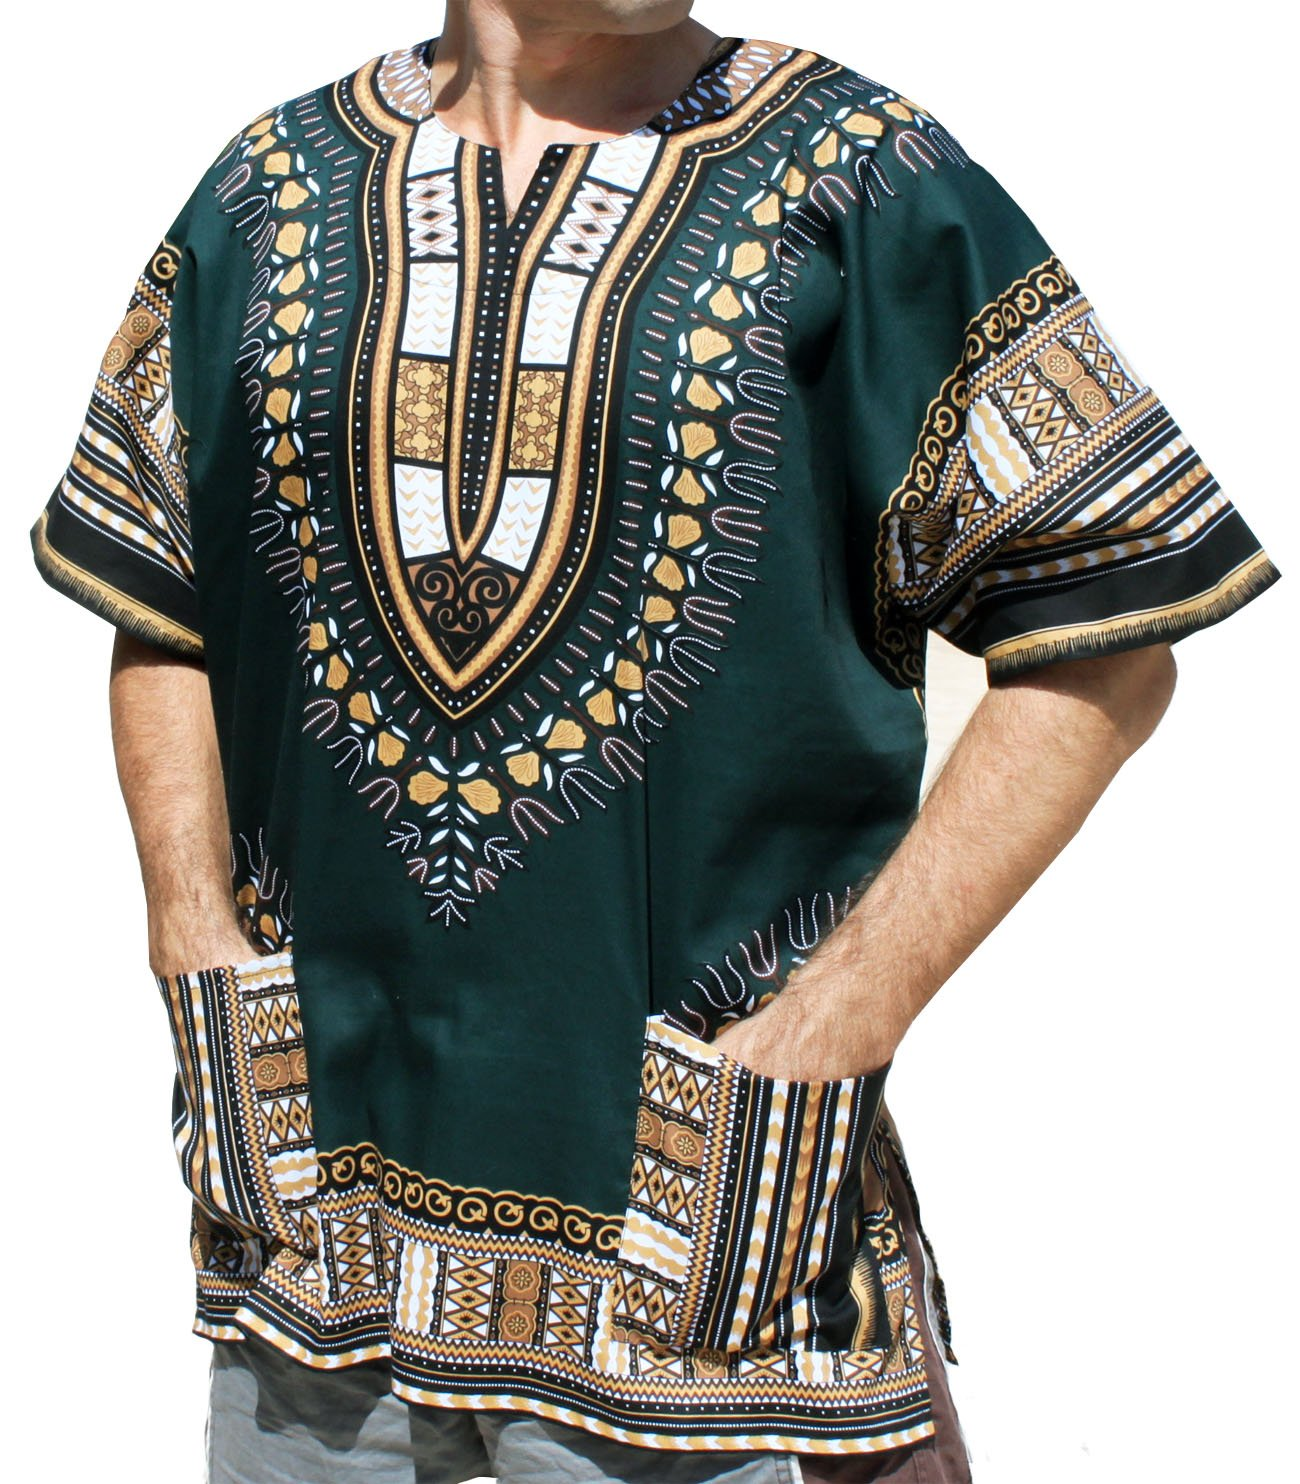 Raan Pah Muang RaanPahMuang Unisex African Bright Dashiki Cotton Shirt Variety Colors, XX-Large, Green Brown